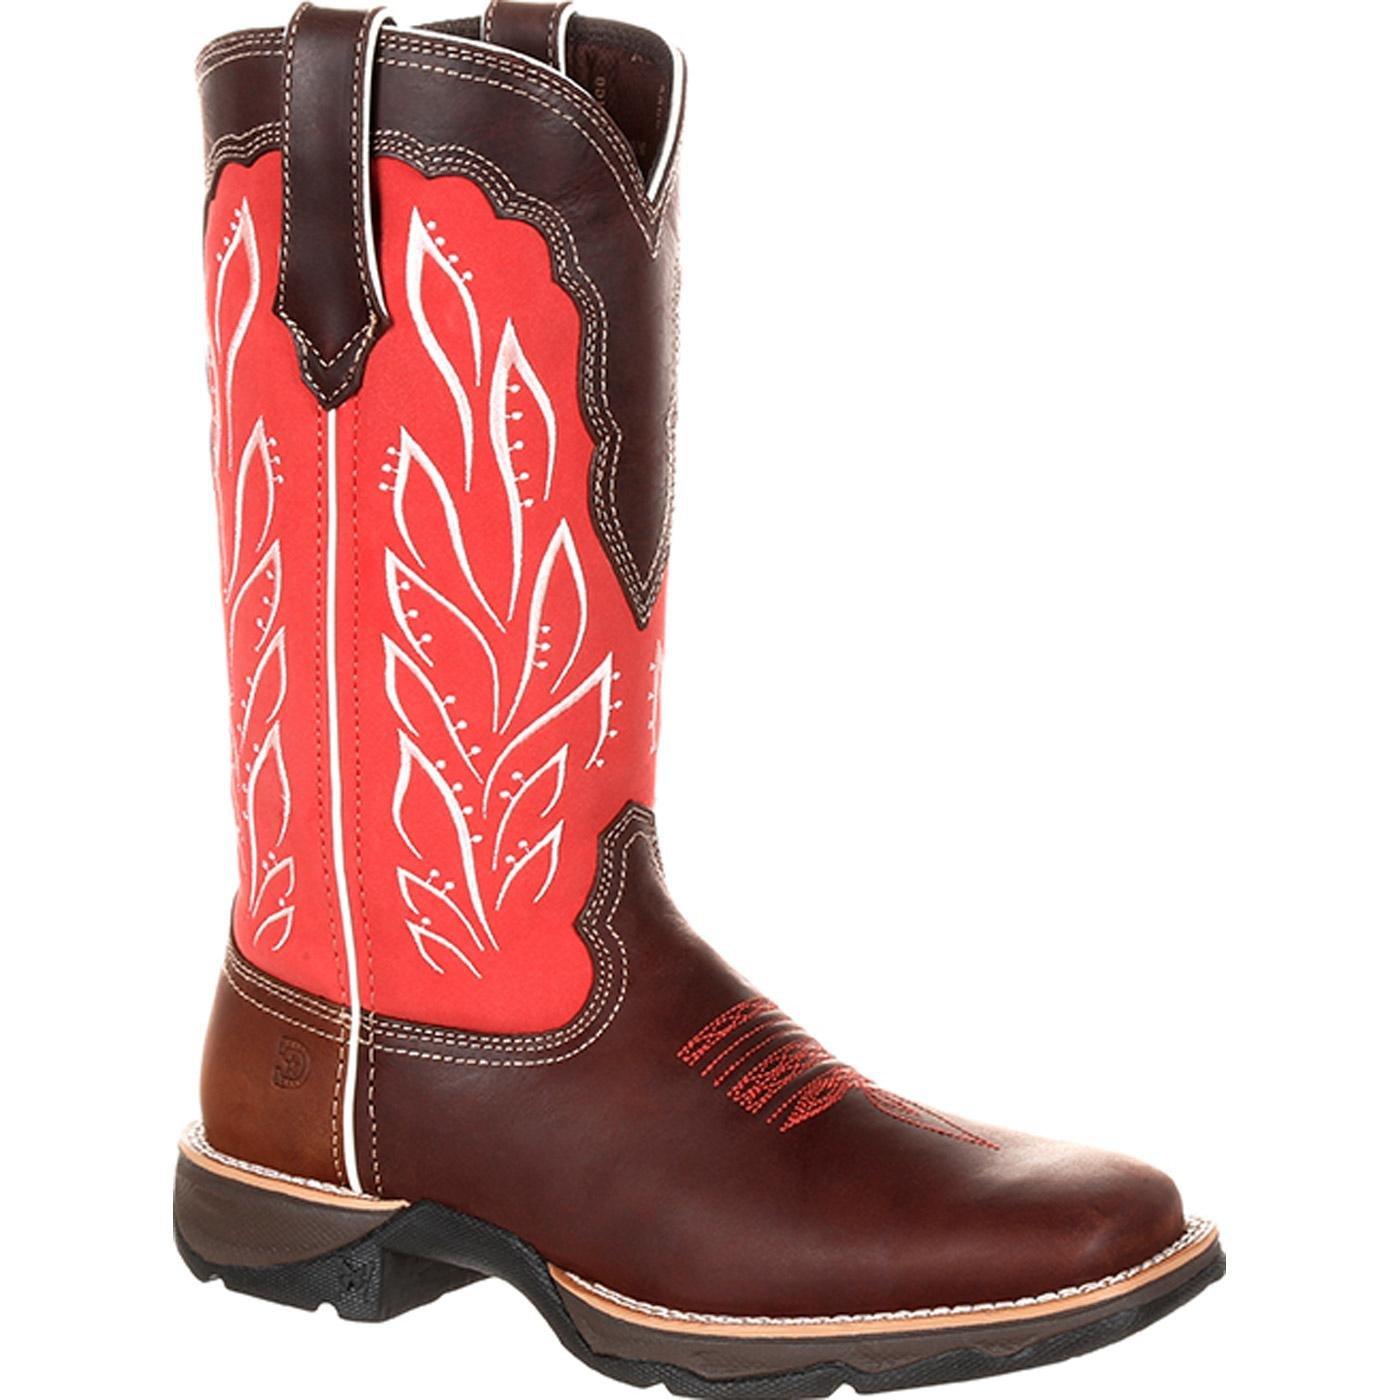 Durango Women's Lady Rebel Western Boot B07DJB28XM 7 M US|Mahogany Strawberry Sunrise